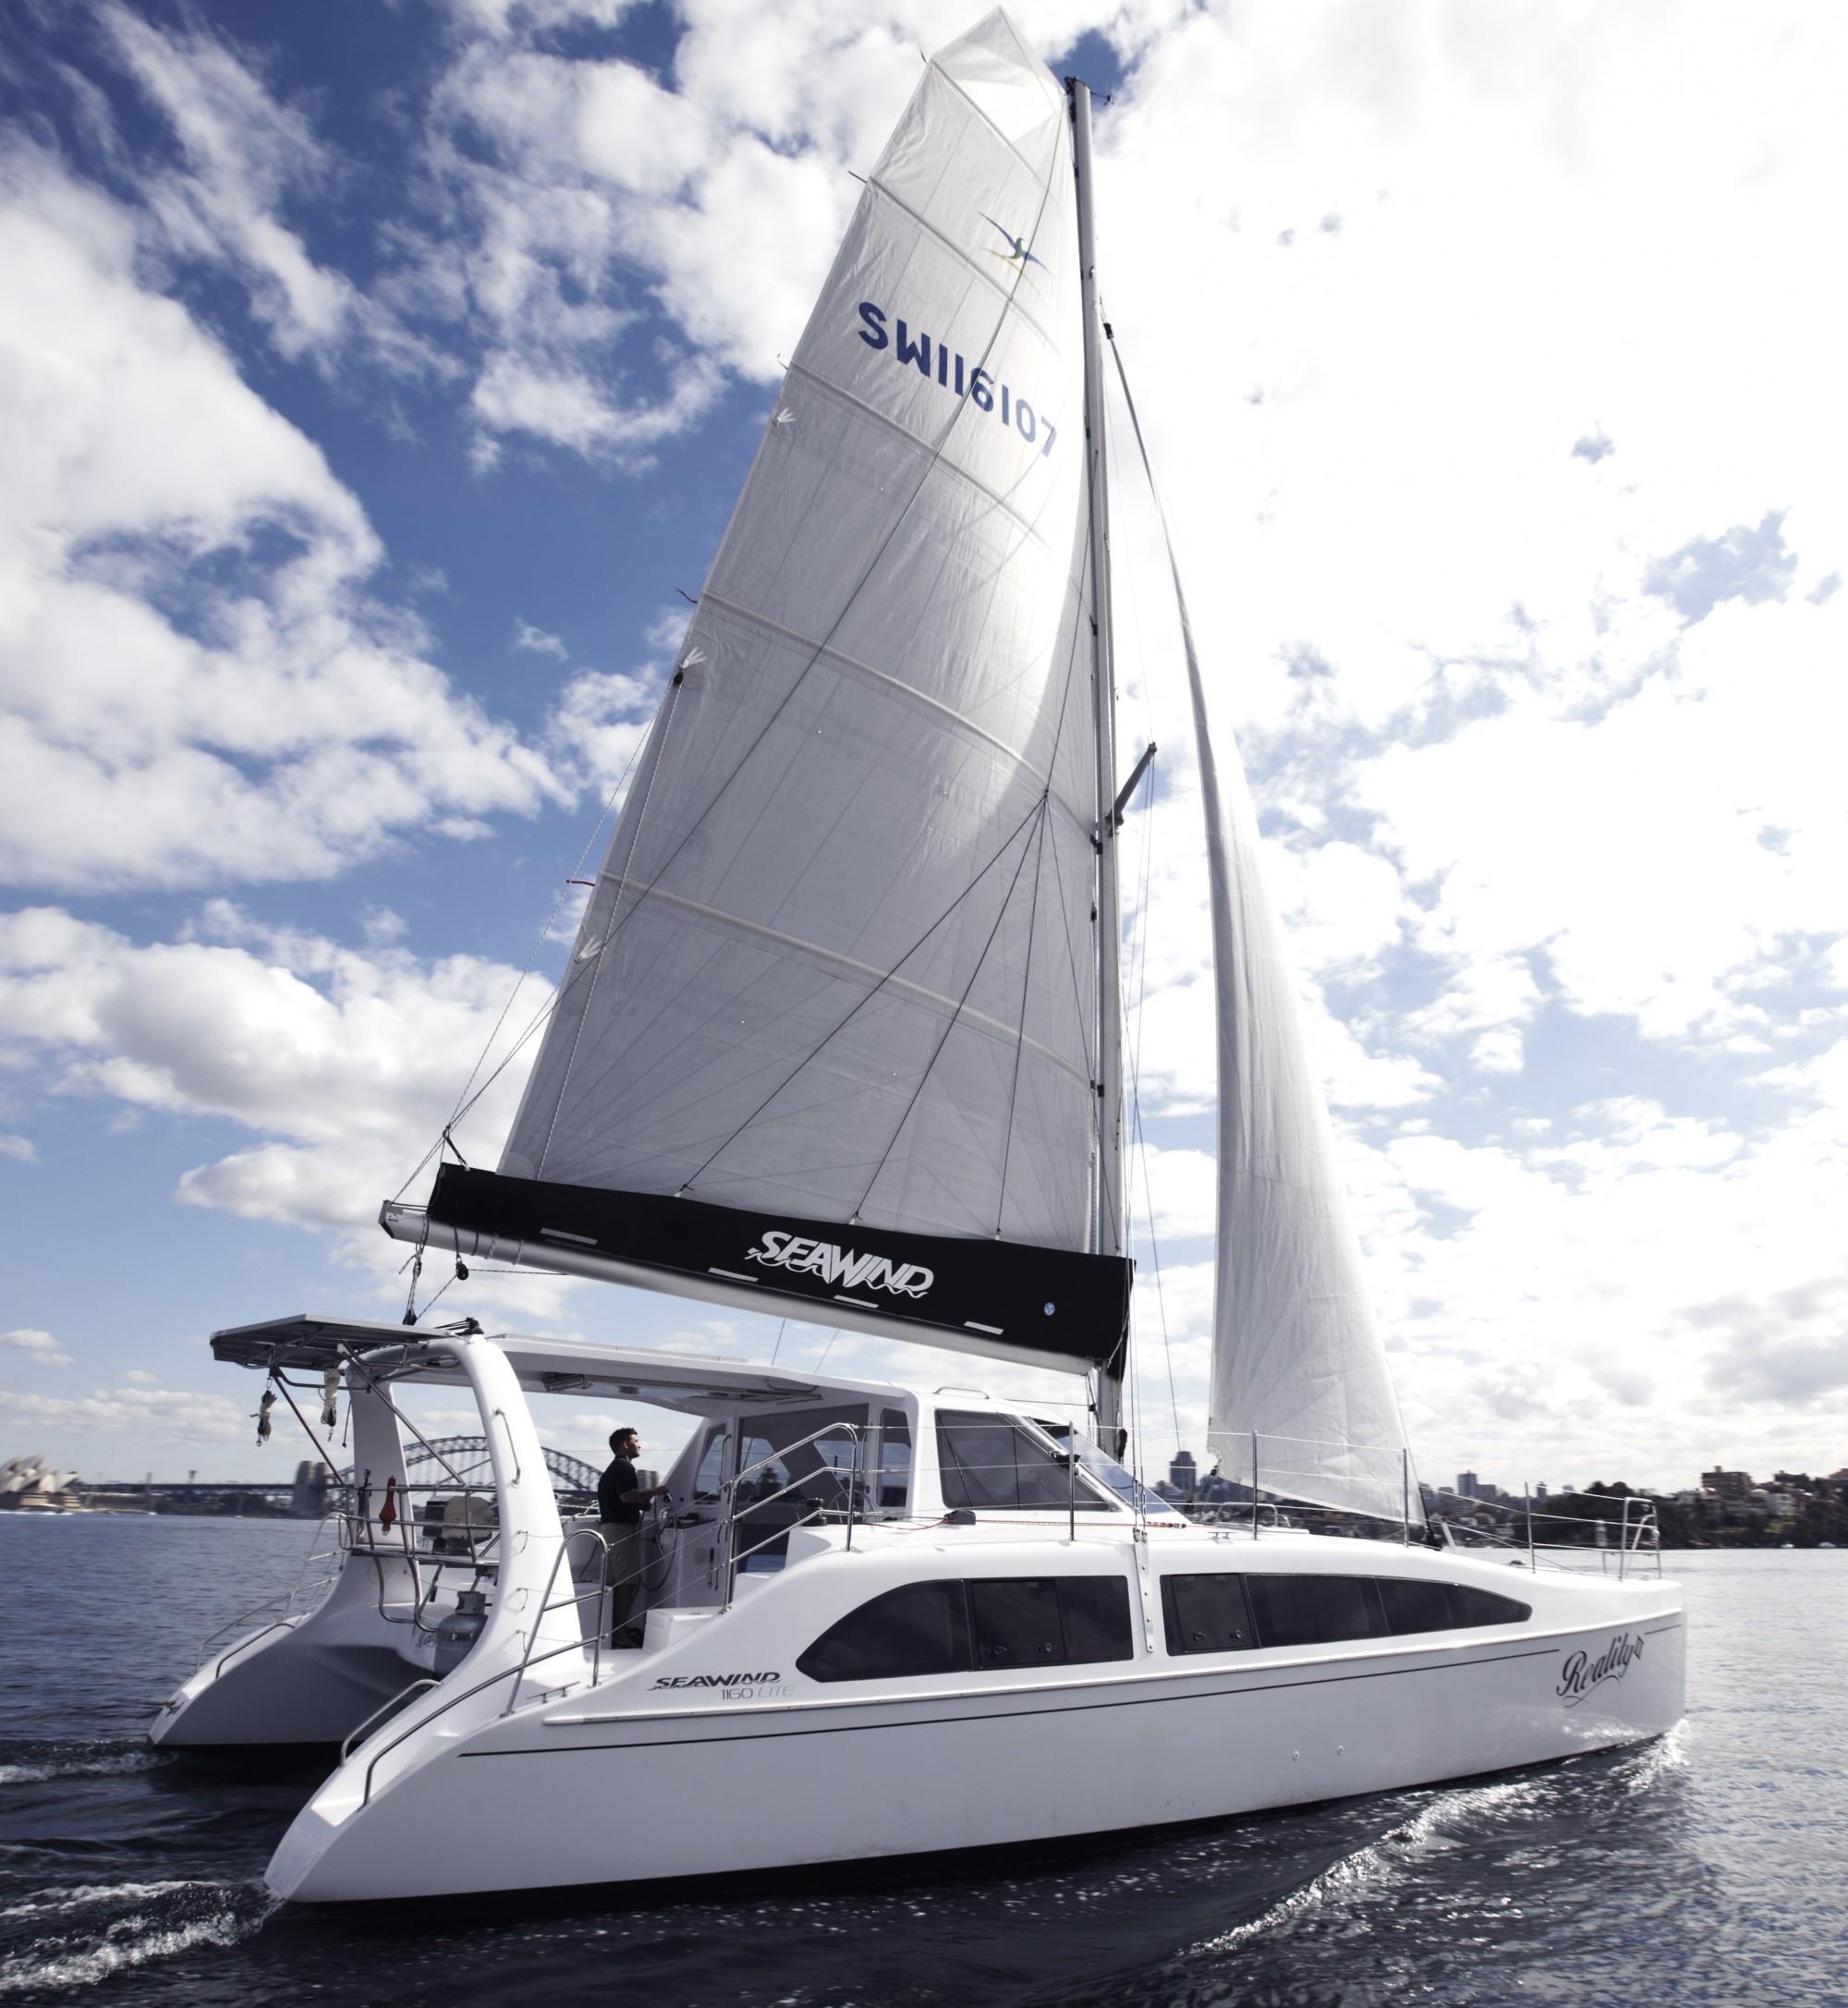 Seawind 1160 video